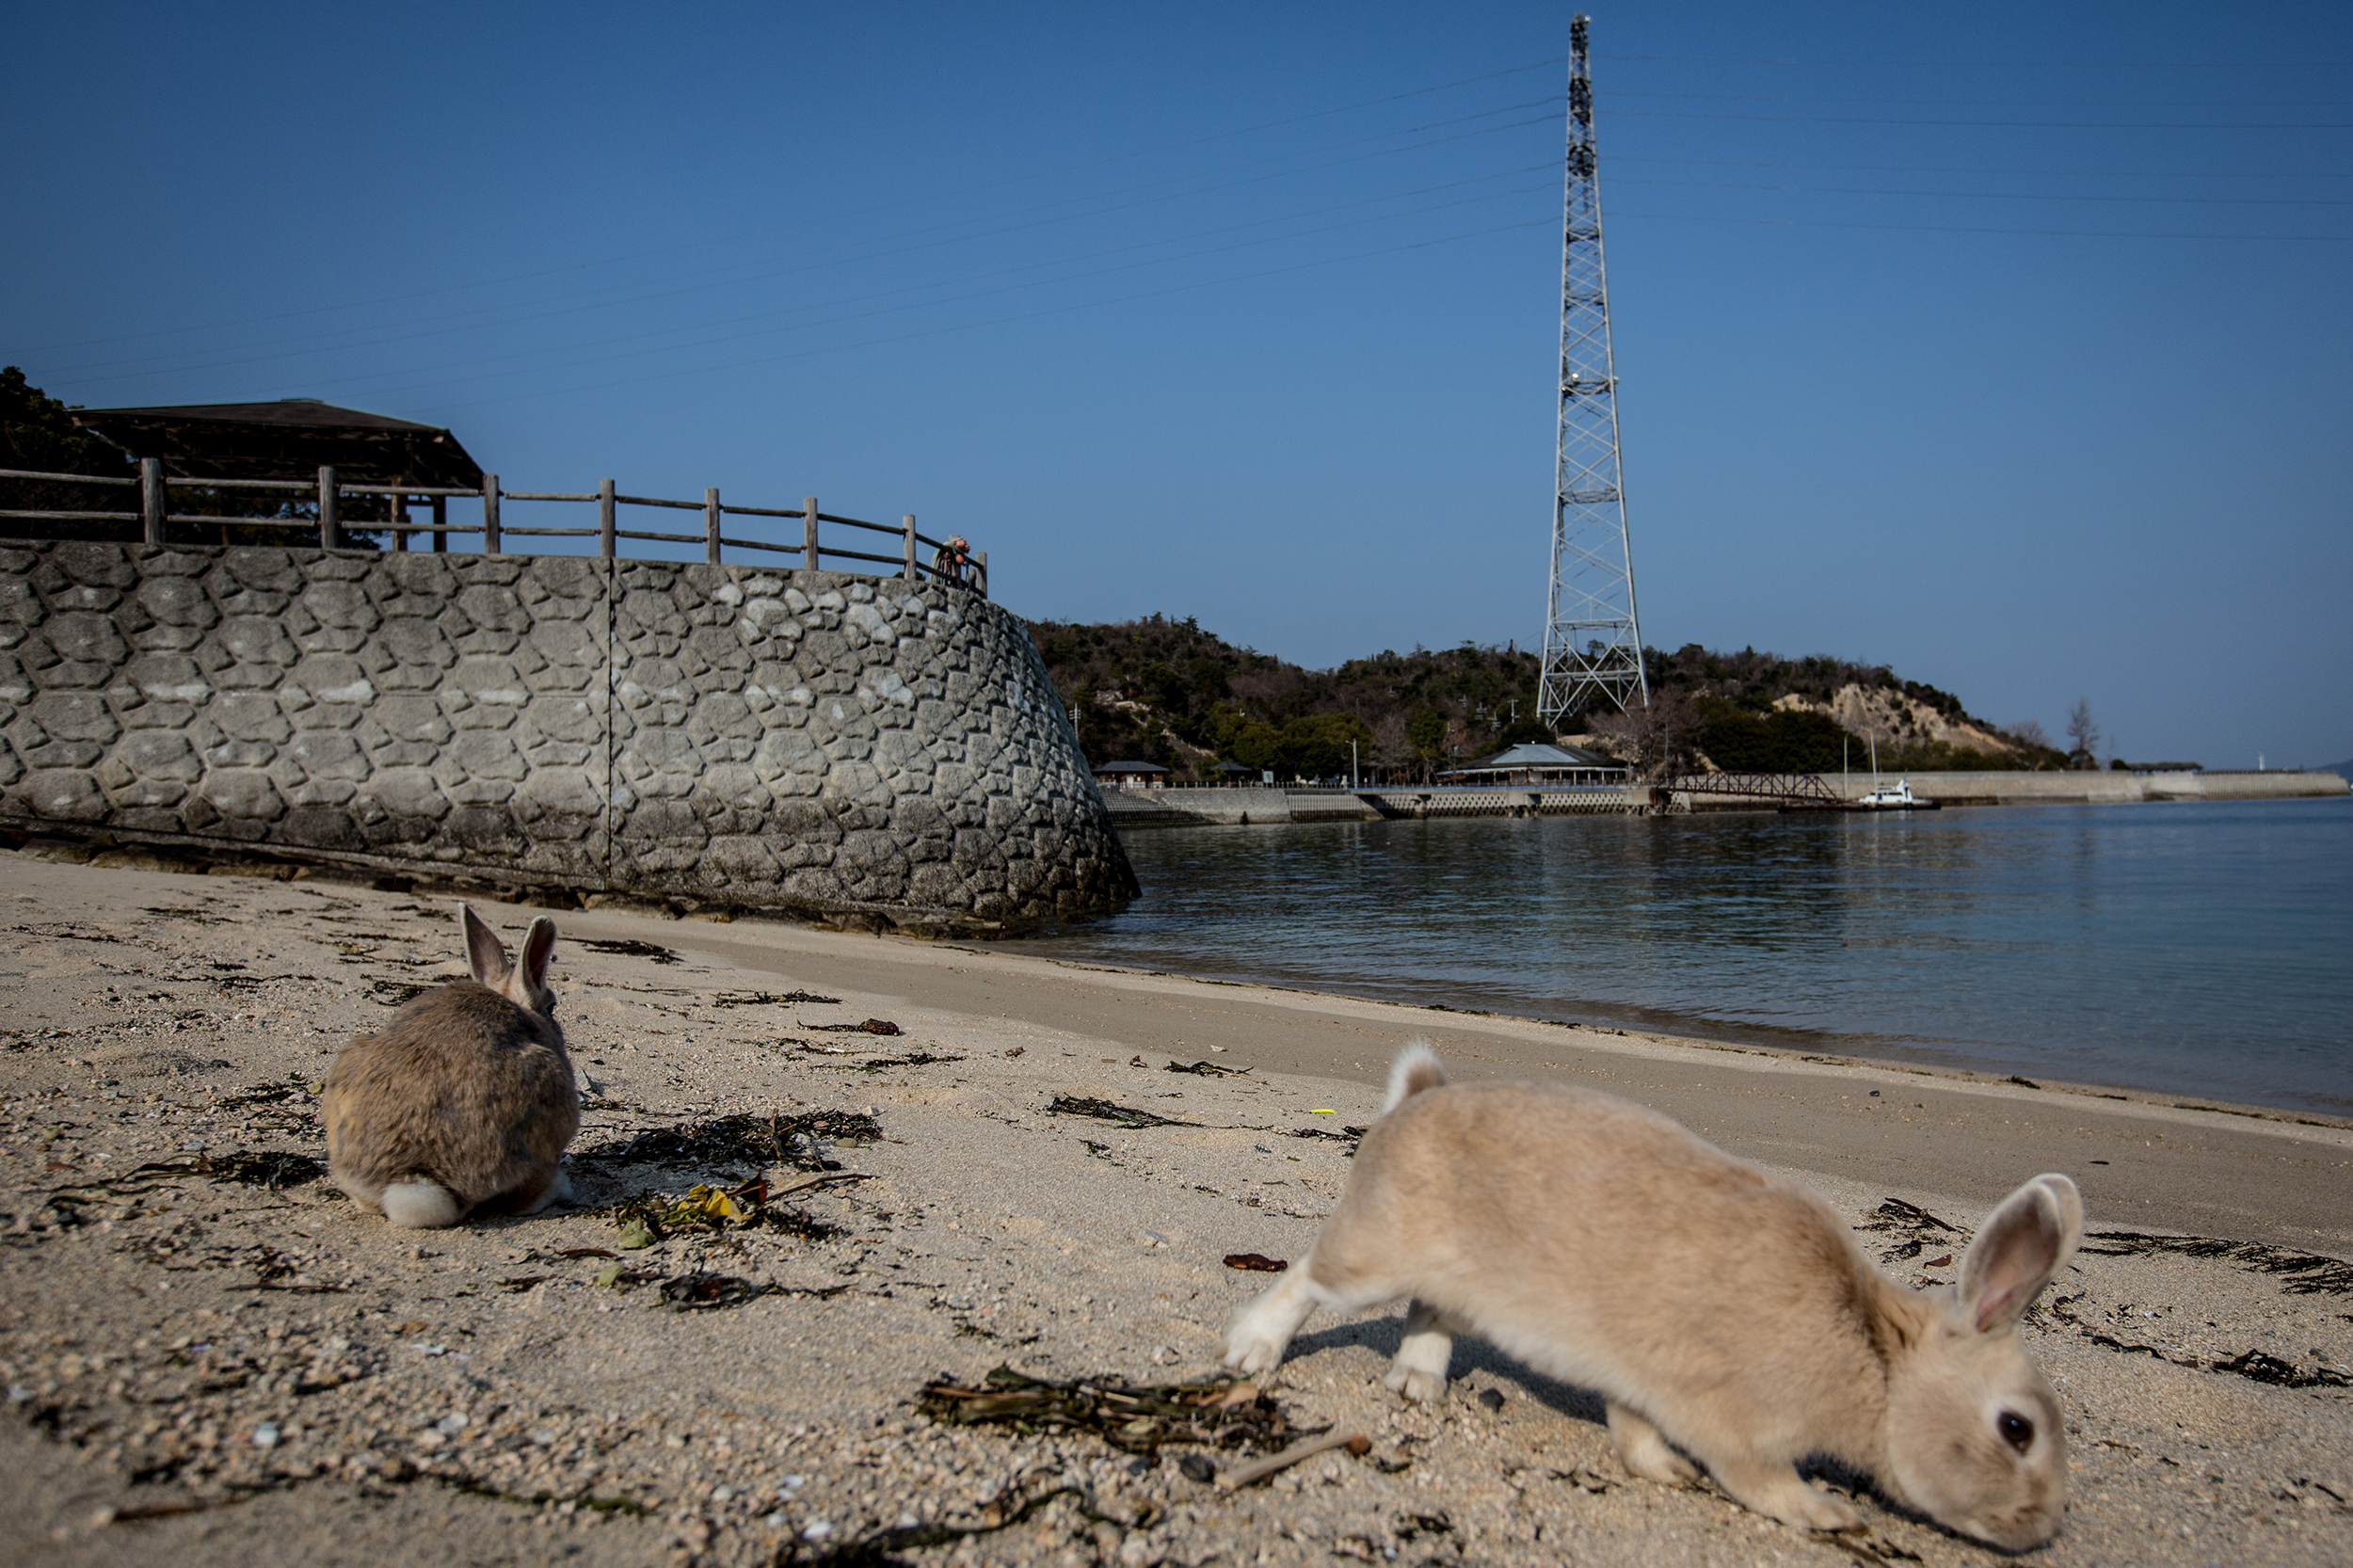 Rabbits forage for food on the beach at  Okunoshima Island on Feb. 24, 2014 in Takehara, Japan.